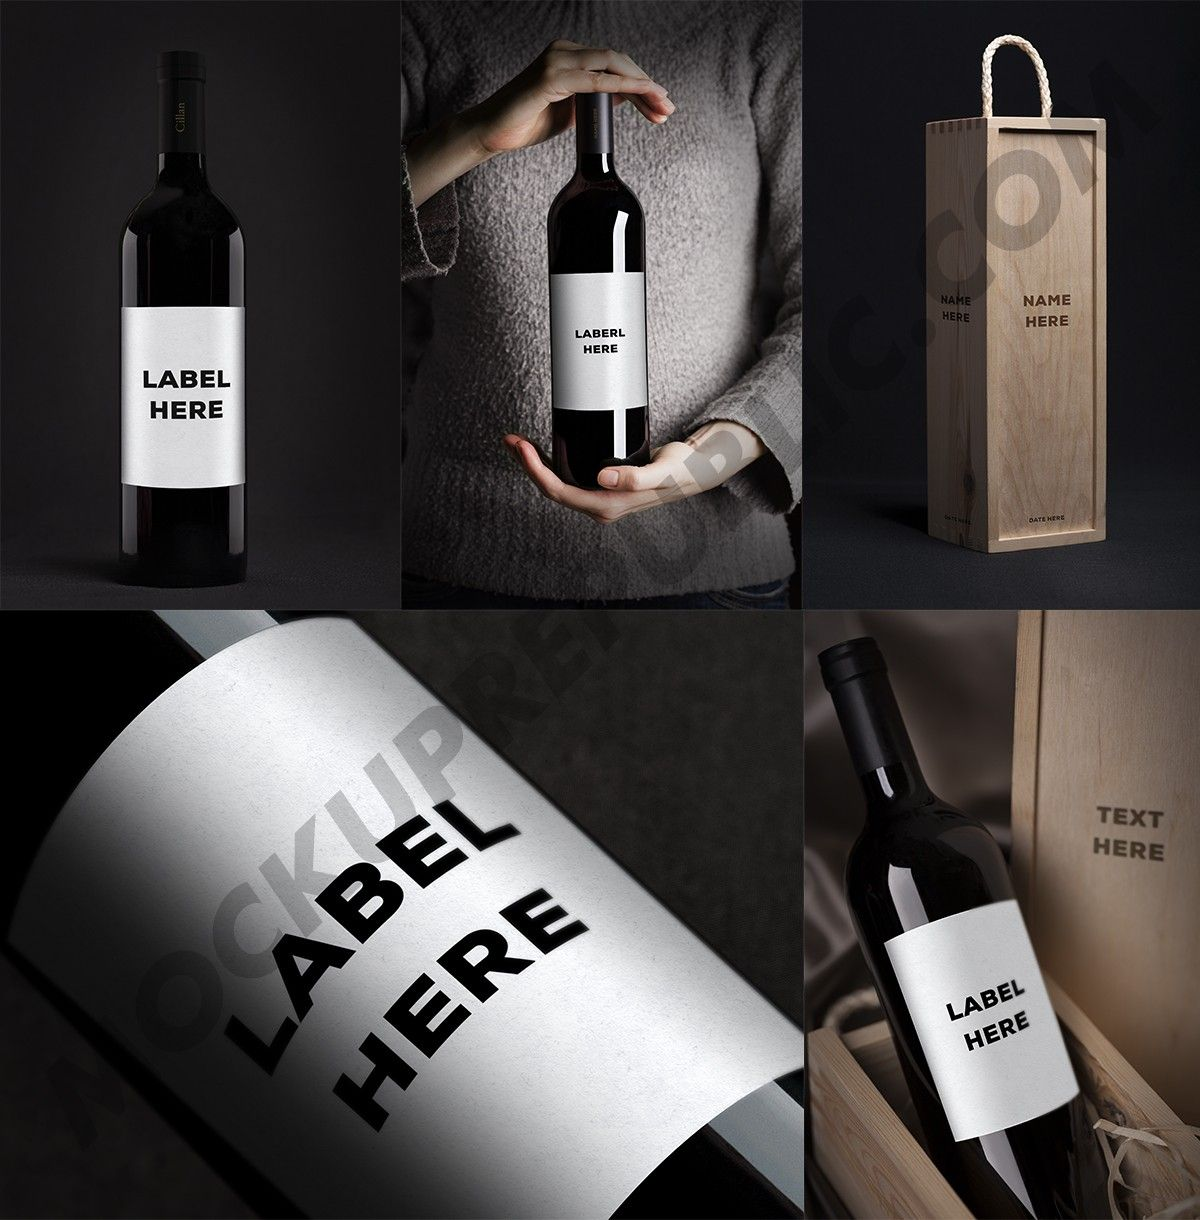 Download Mockuprepublic Com All Free Psd Mockups Elegant Wine Bottle Wine Bottle Box Bottle Box